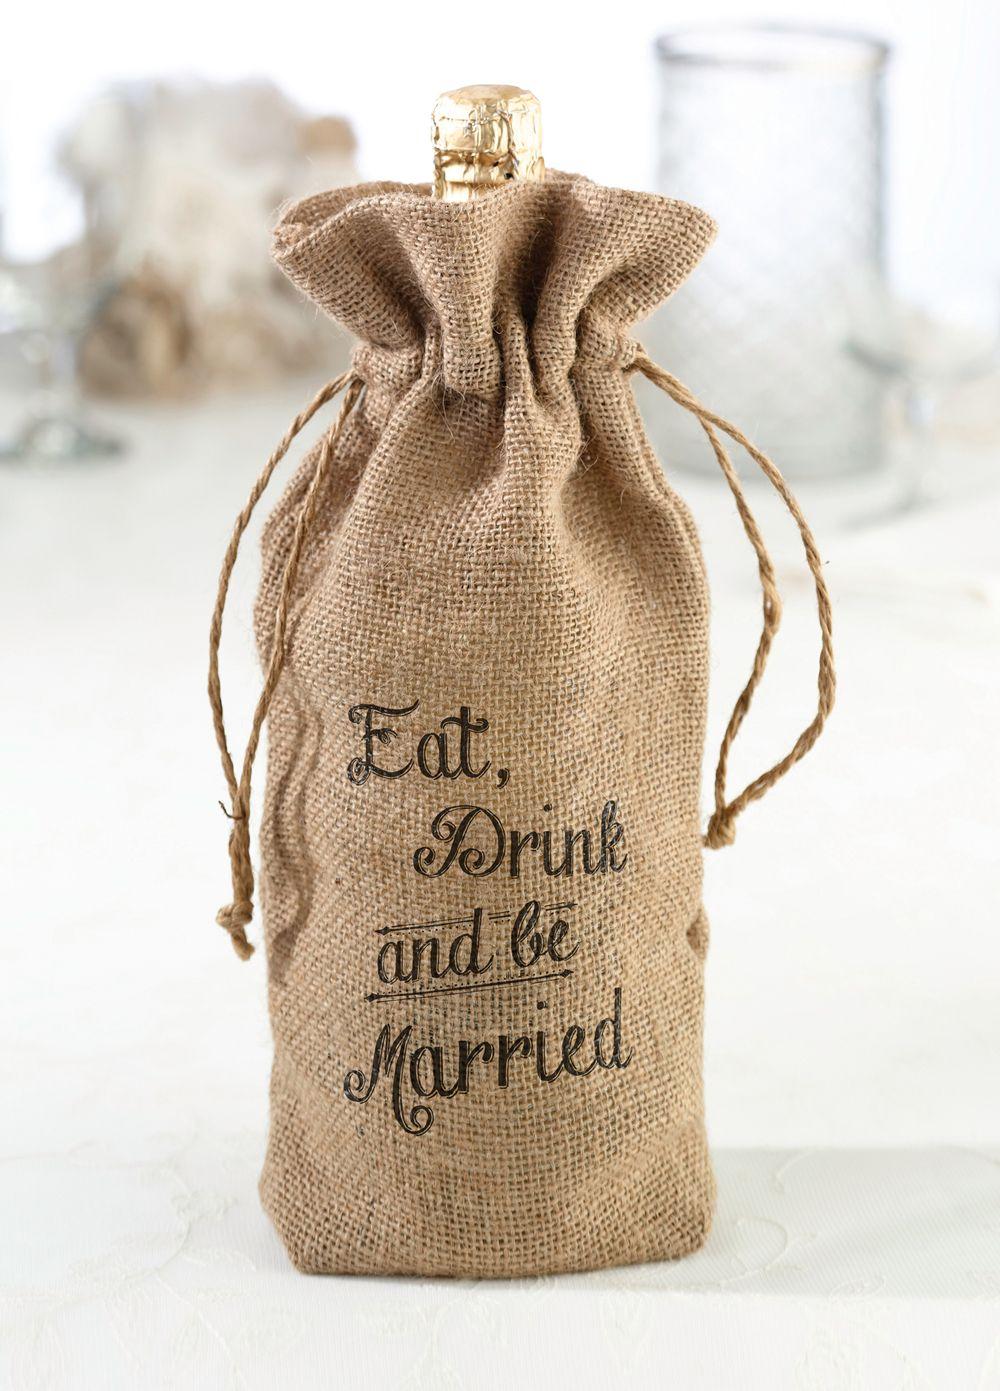 Eat drink and be married burlap wine bag wine bag